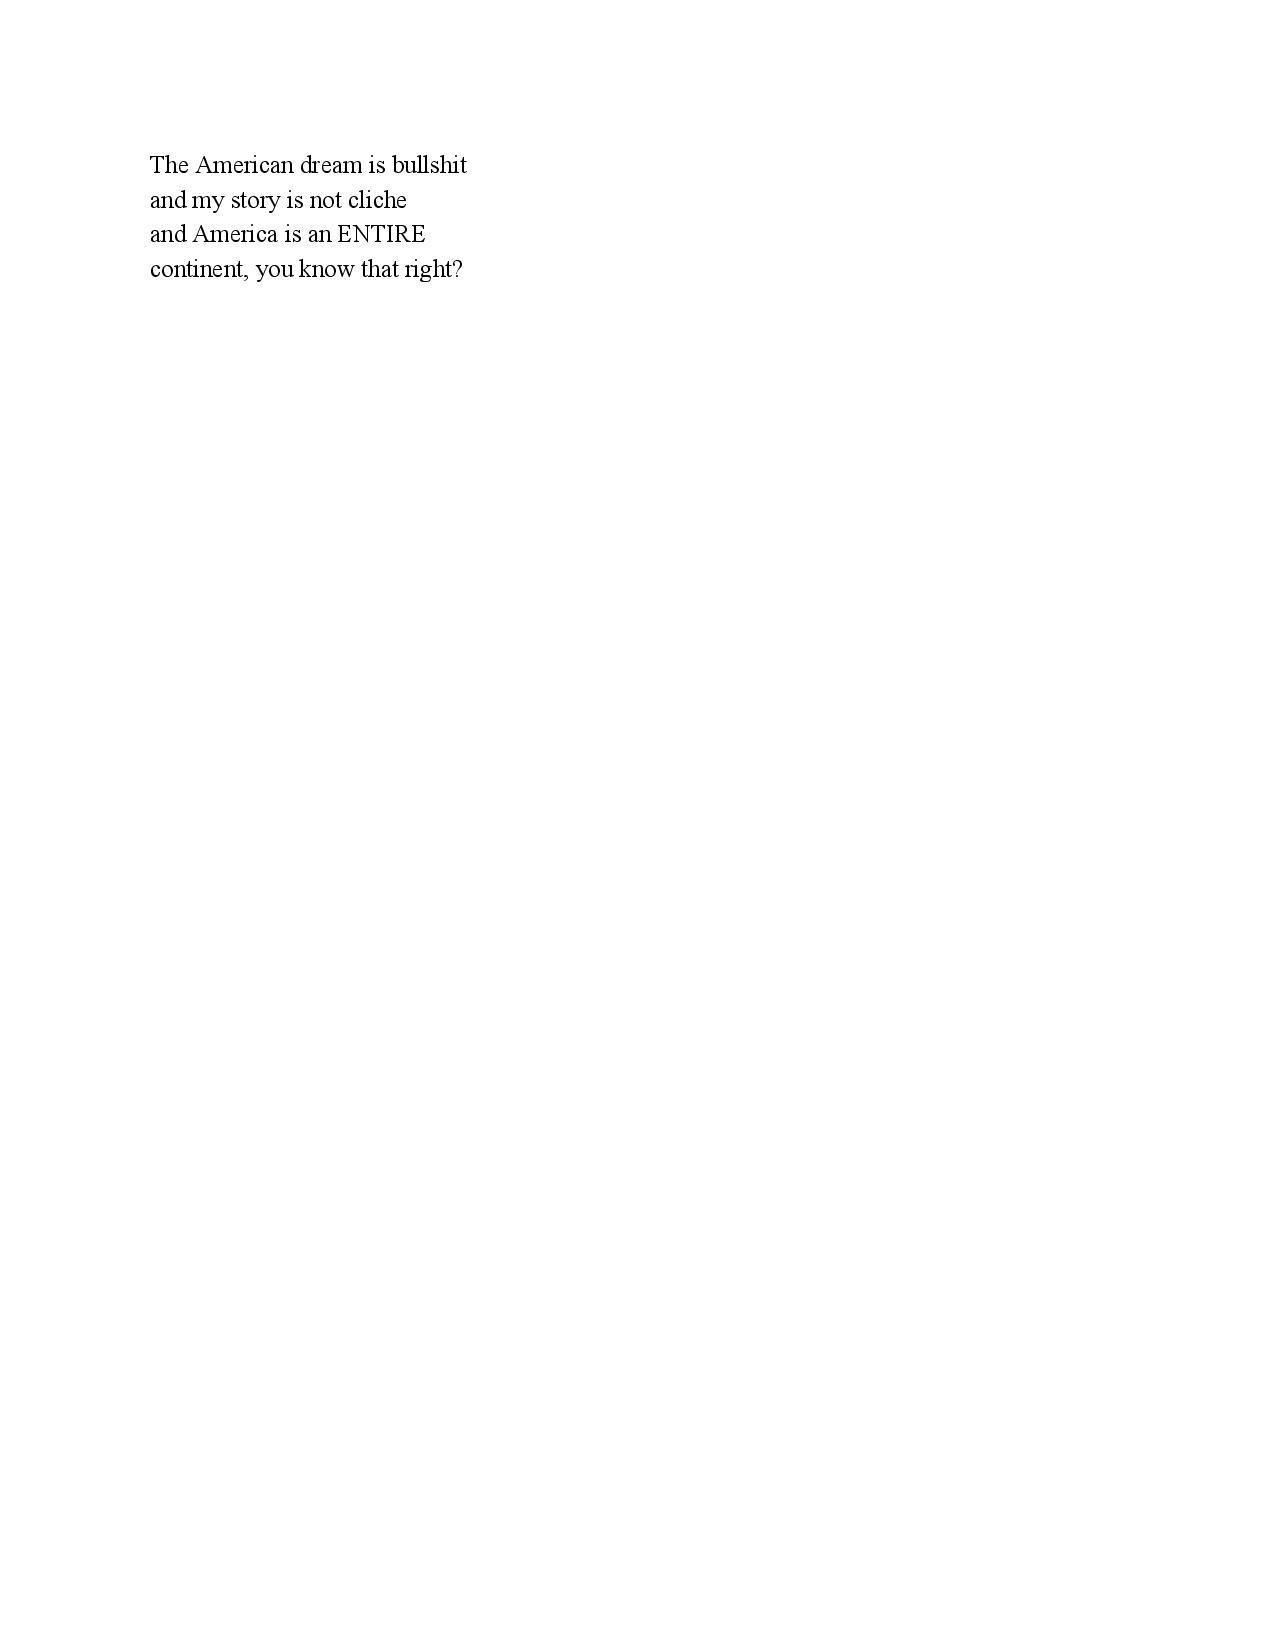 PROMETHEUS II_ Le Reve-page-004.jpg